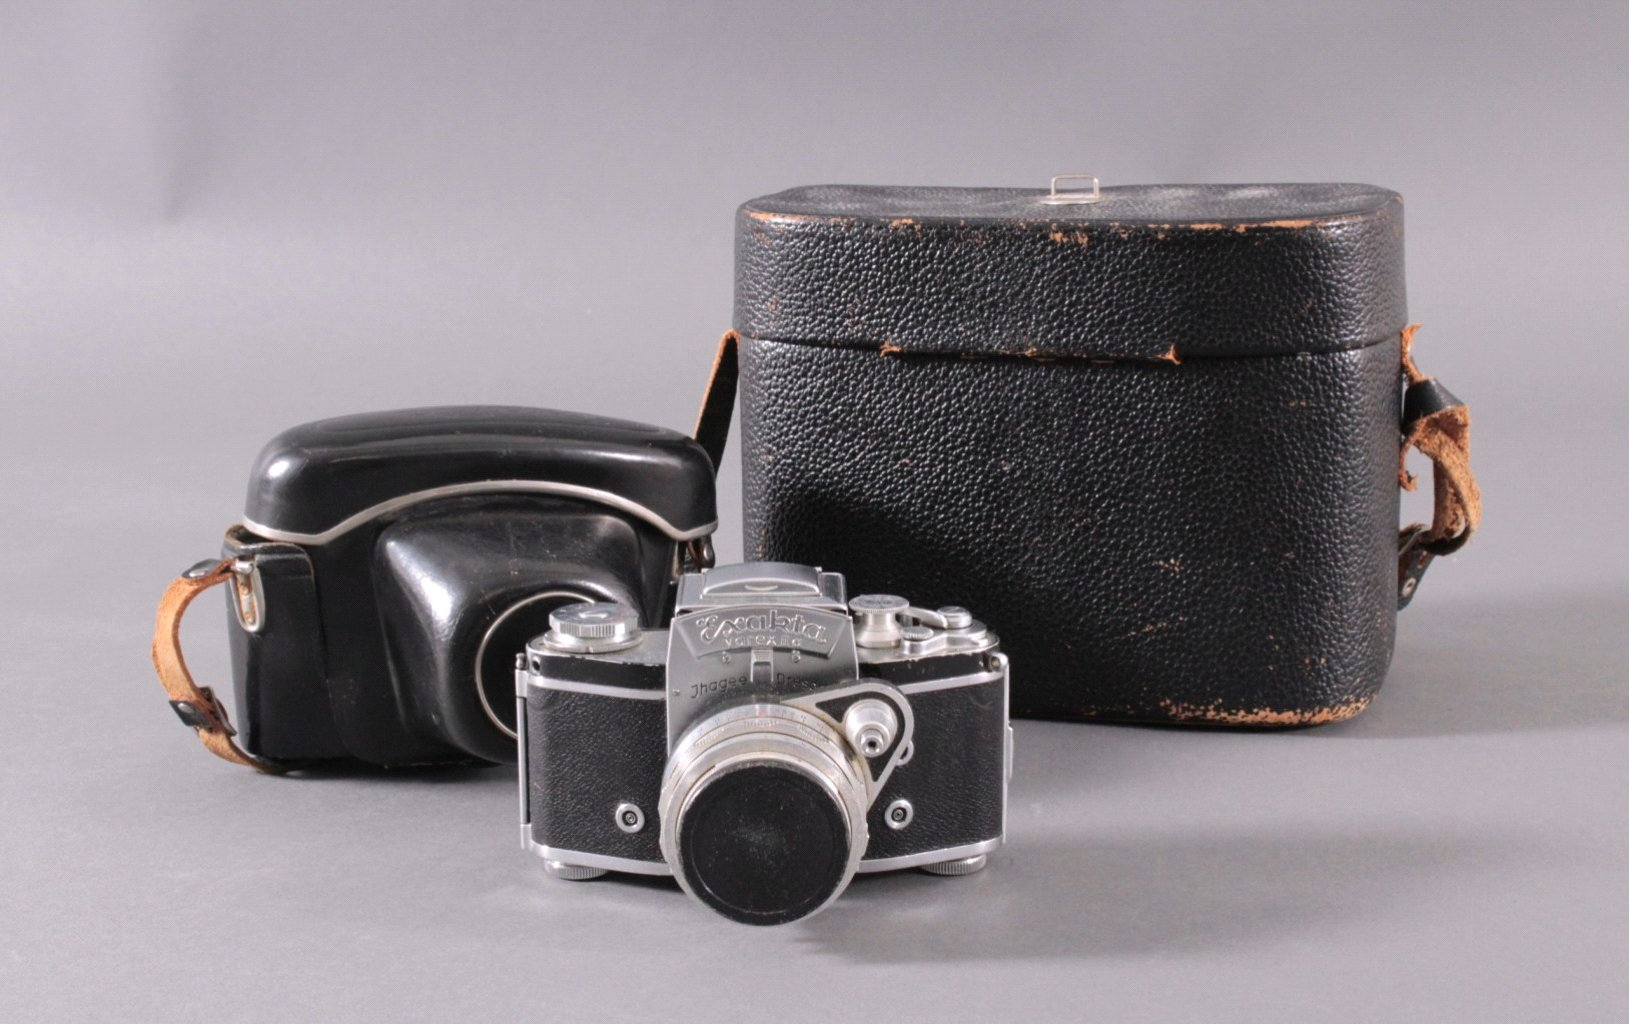 Spiegelreflex-Kamera Exakta Varex IIa. 24x36mm. 1958